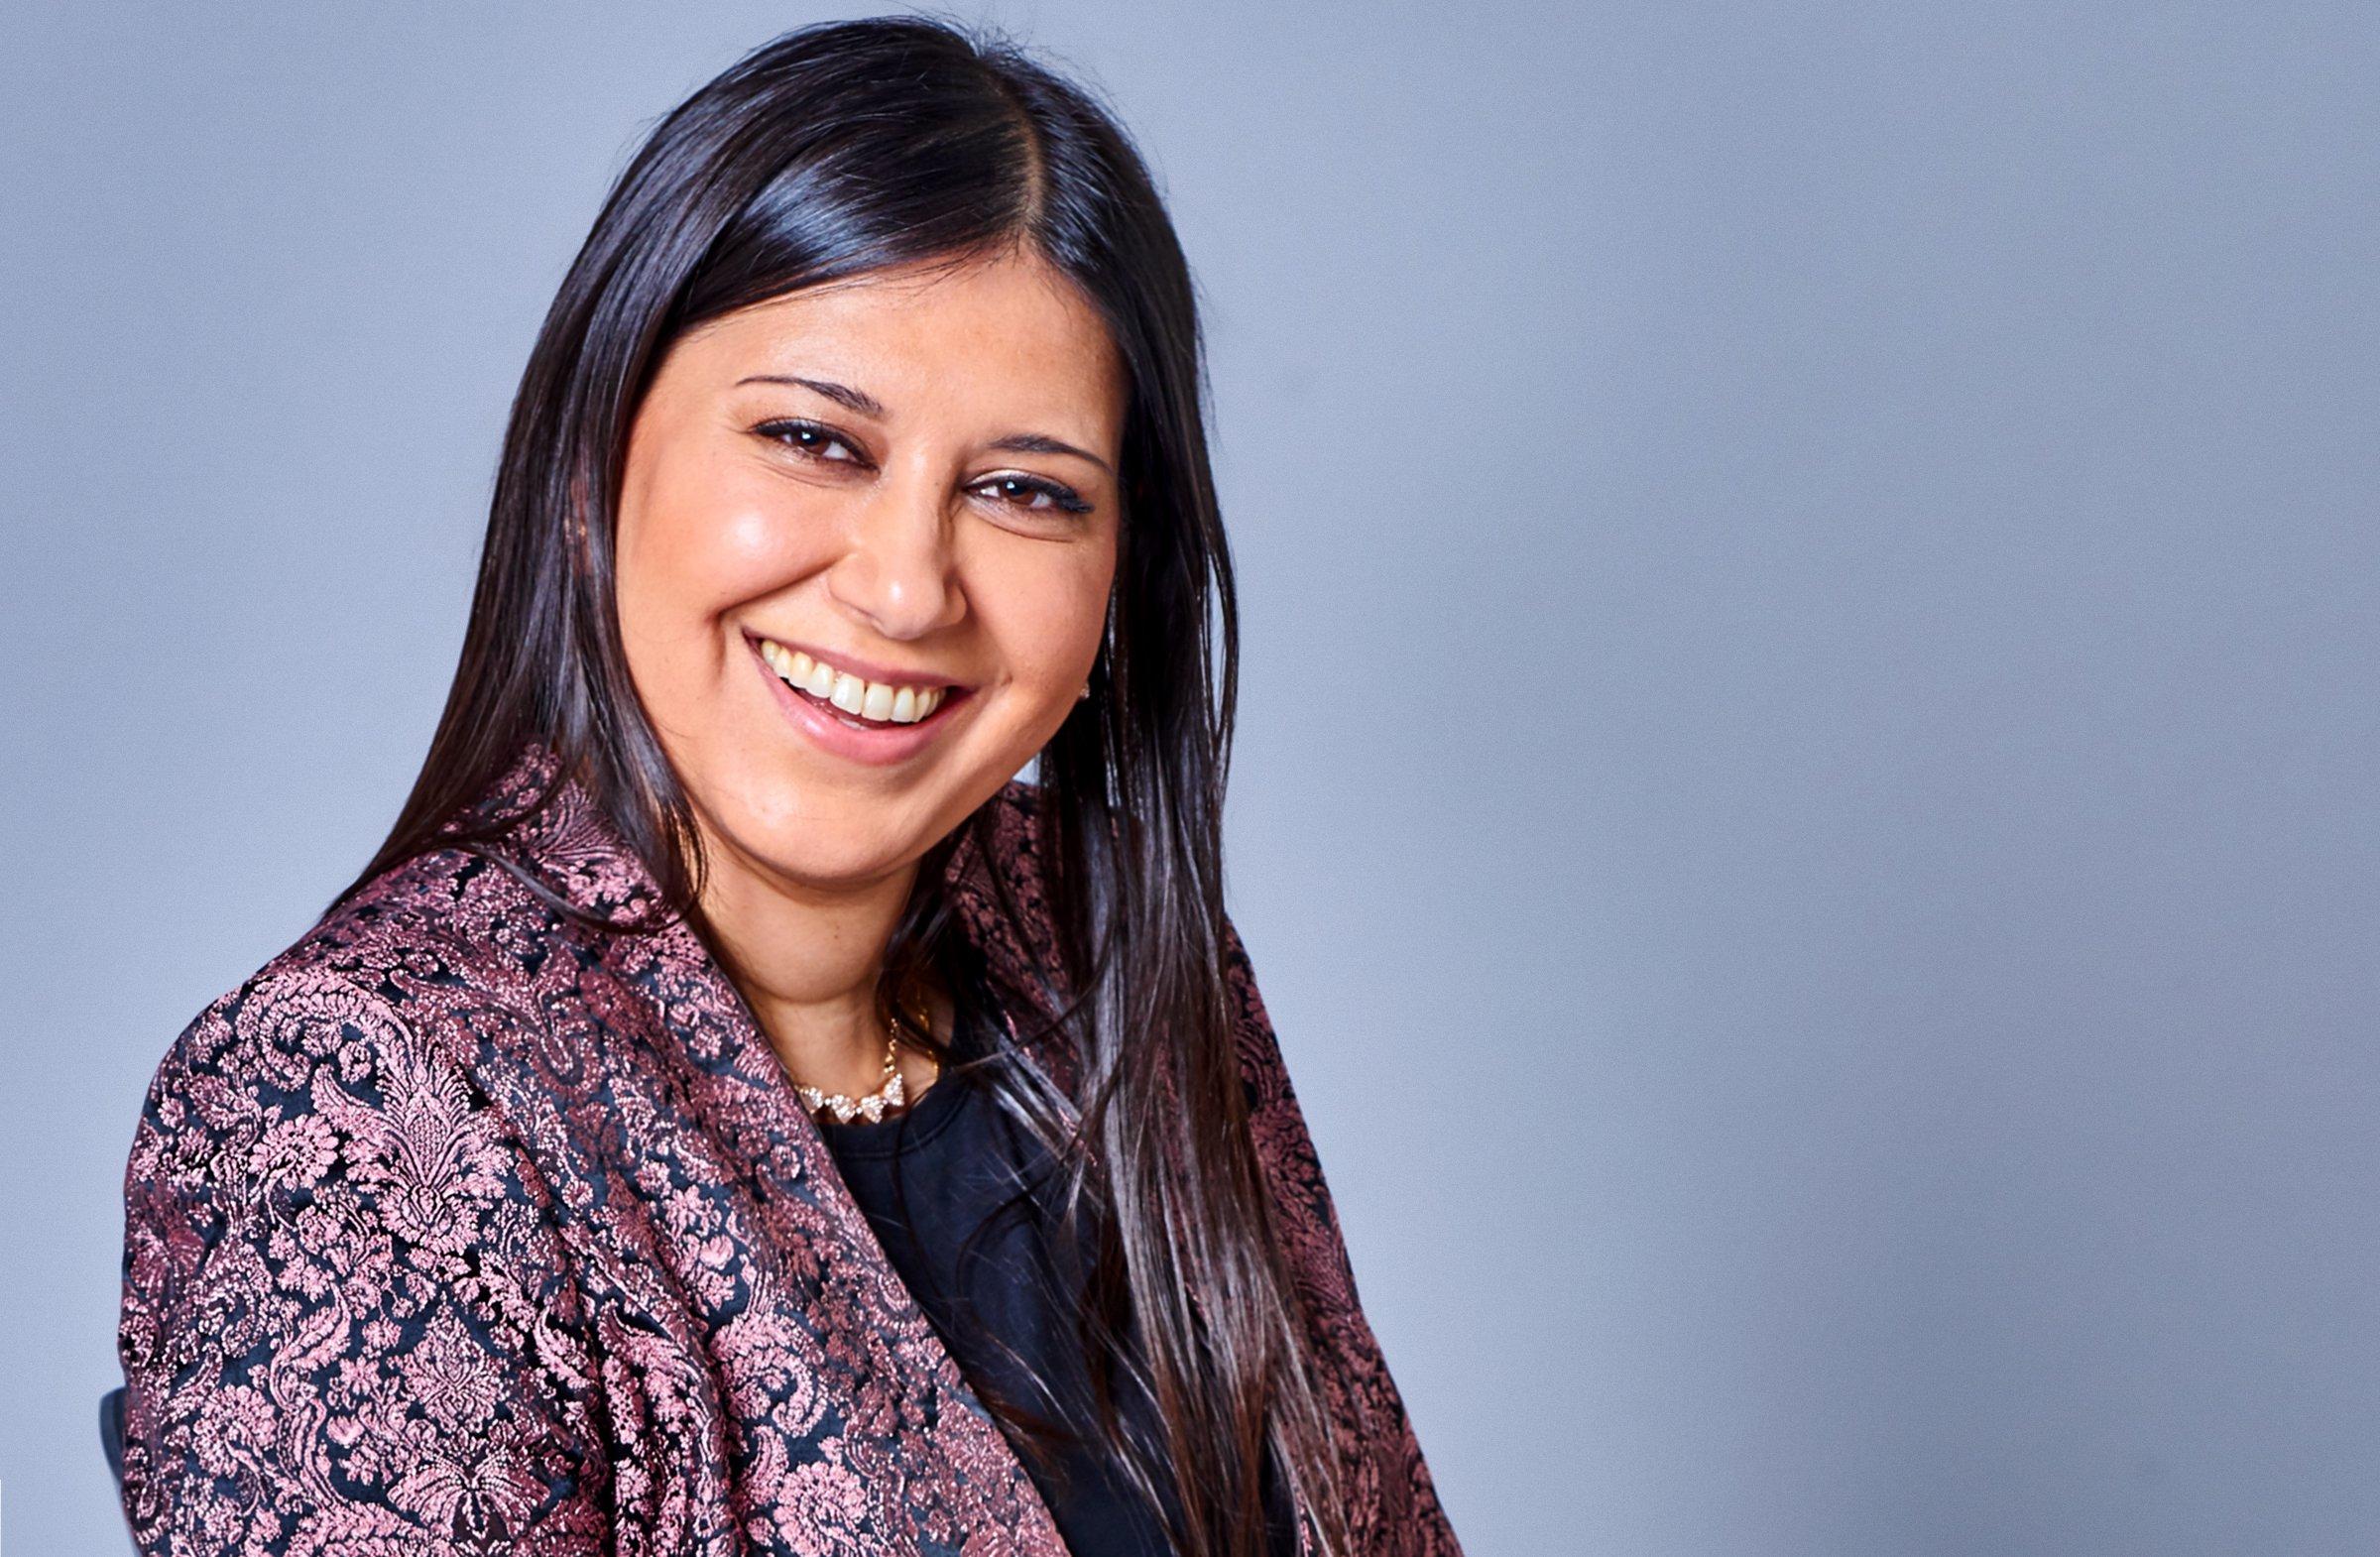 Shaherazad Umbreen: Shoe Empowerment Officer